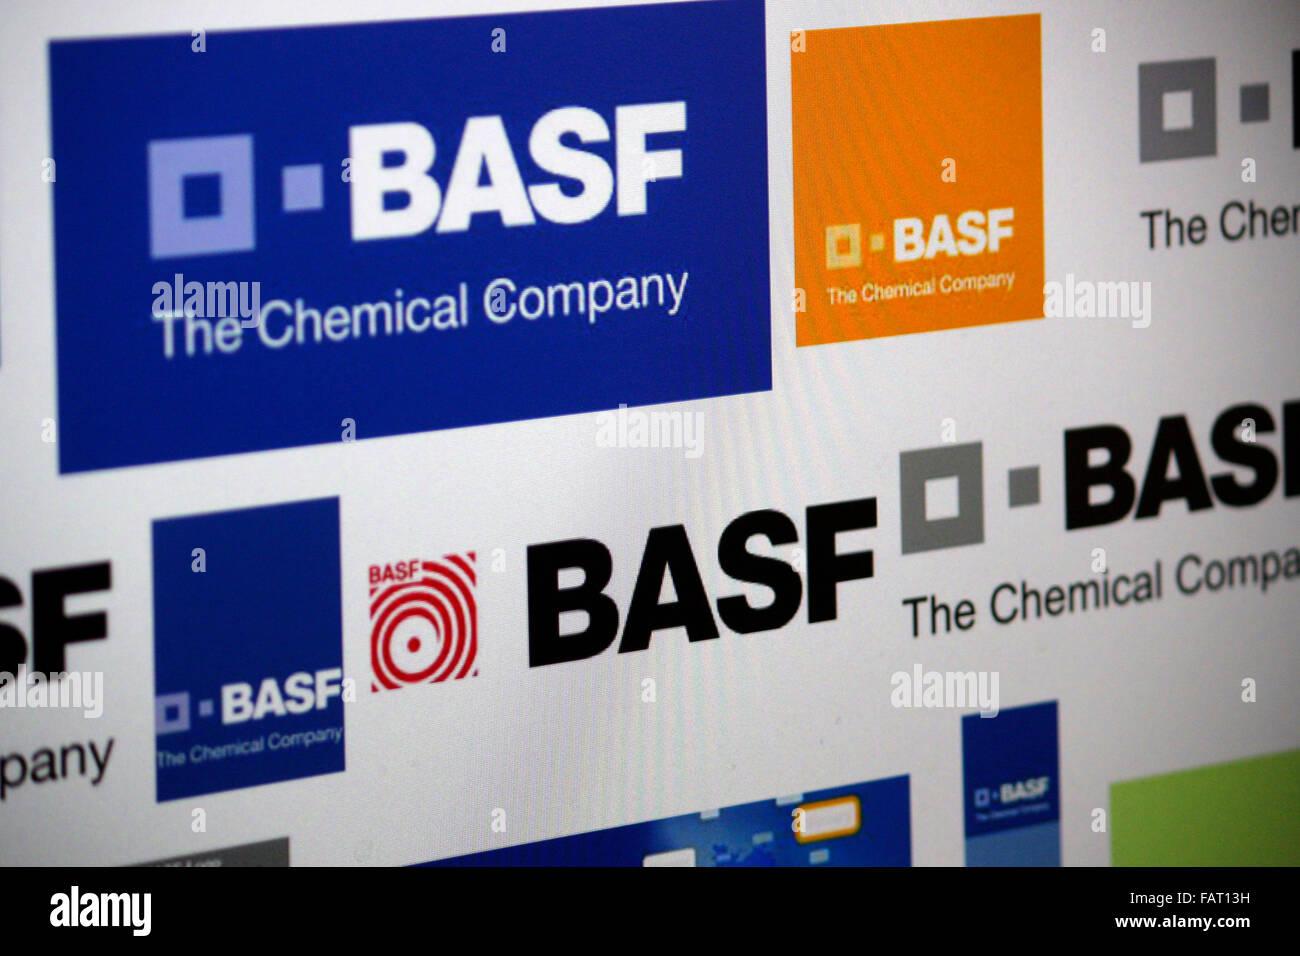 Basf Stock Photos Basf Stock Images Alamy